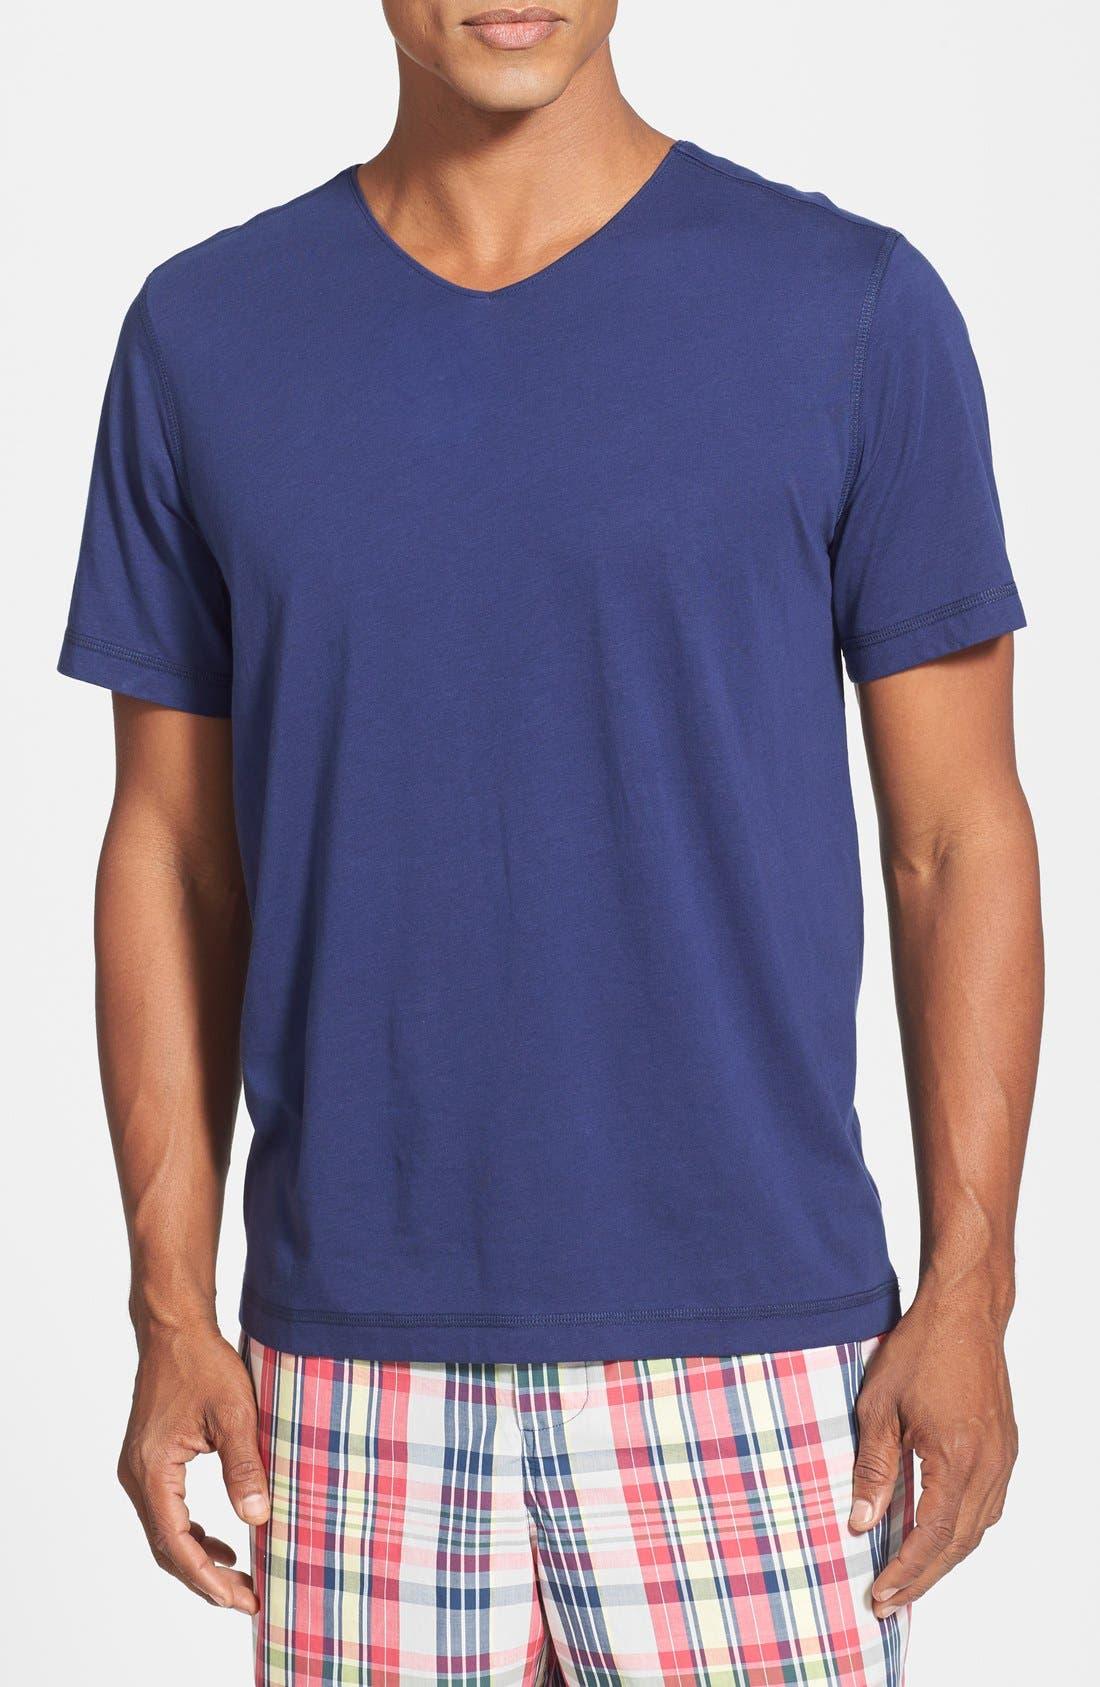 V-Neck Peruvian Pima Cotton T-Shirt,                             Main thumbnail 1, color,                             NAVY